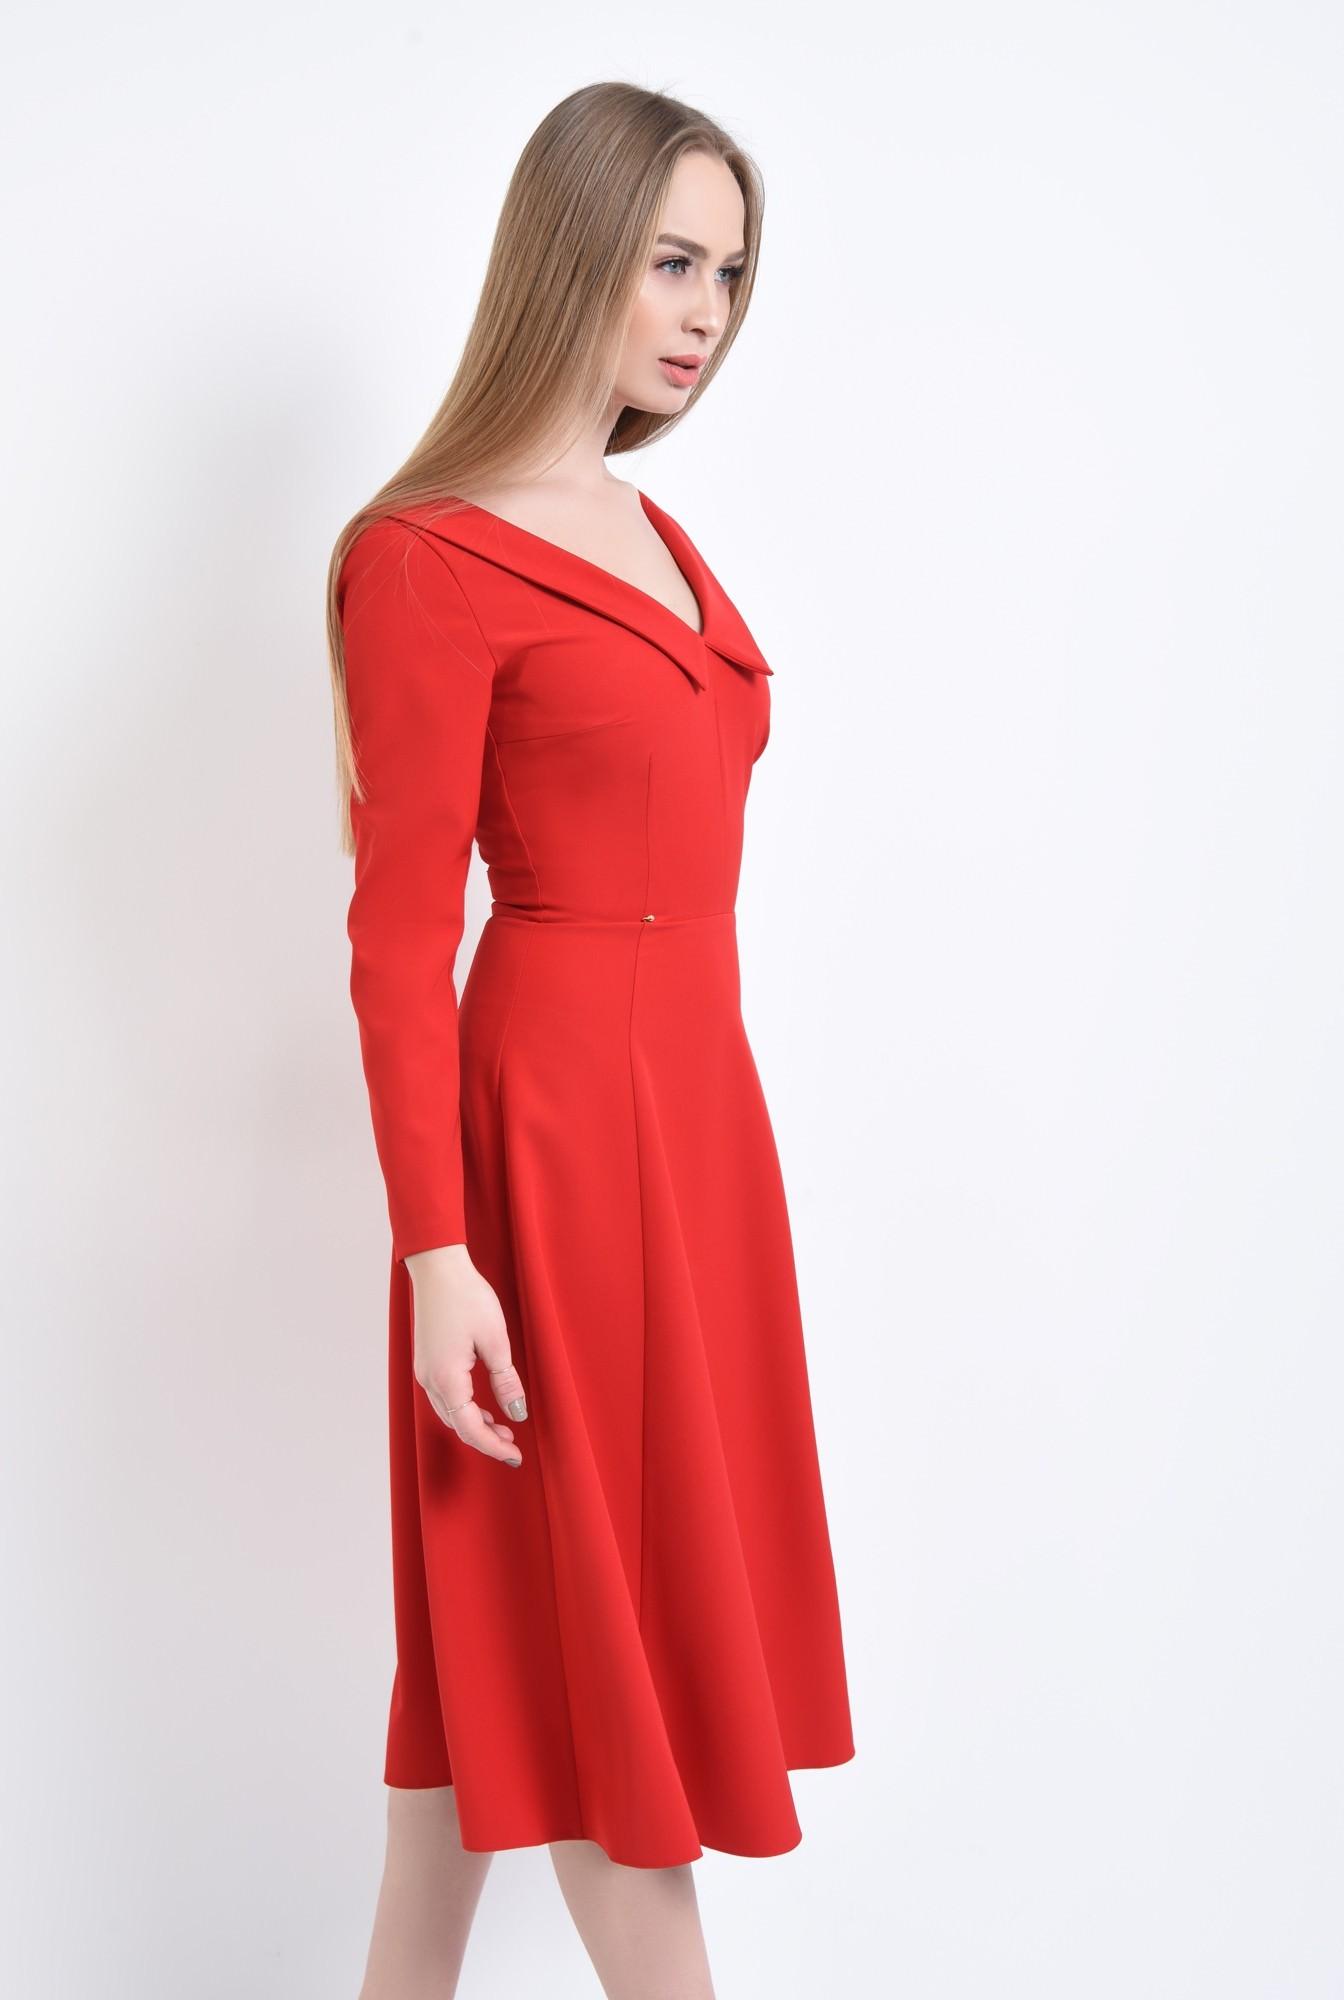 3 - Rochie de zi rosie, cloche